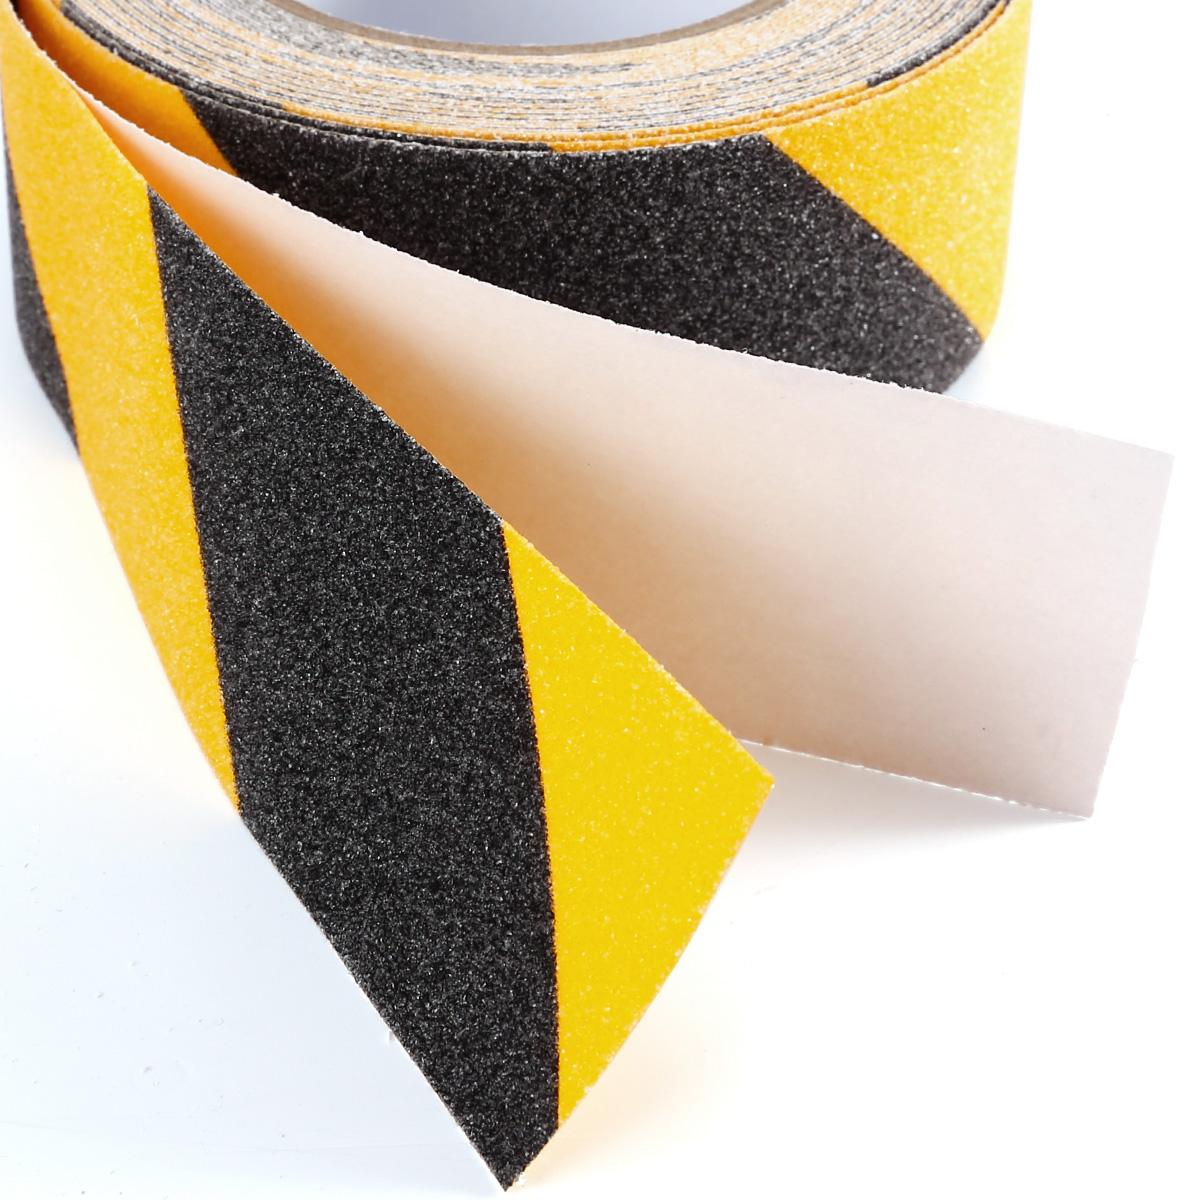 transparent schwarz gelb nachtleuchtend antirutschband klebeband treppe stufe ebay. Black Bedroom Furniture Sets. Home Design Ideas